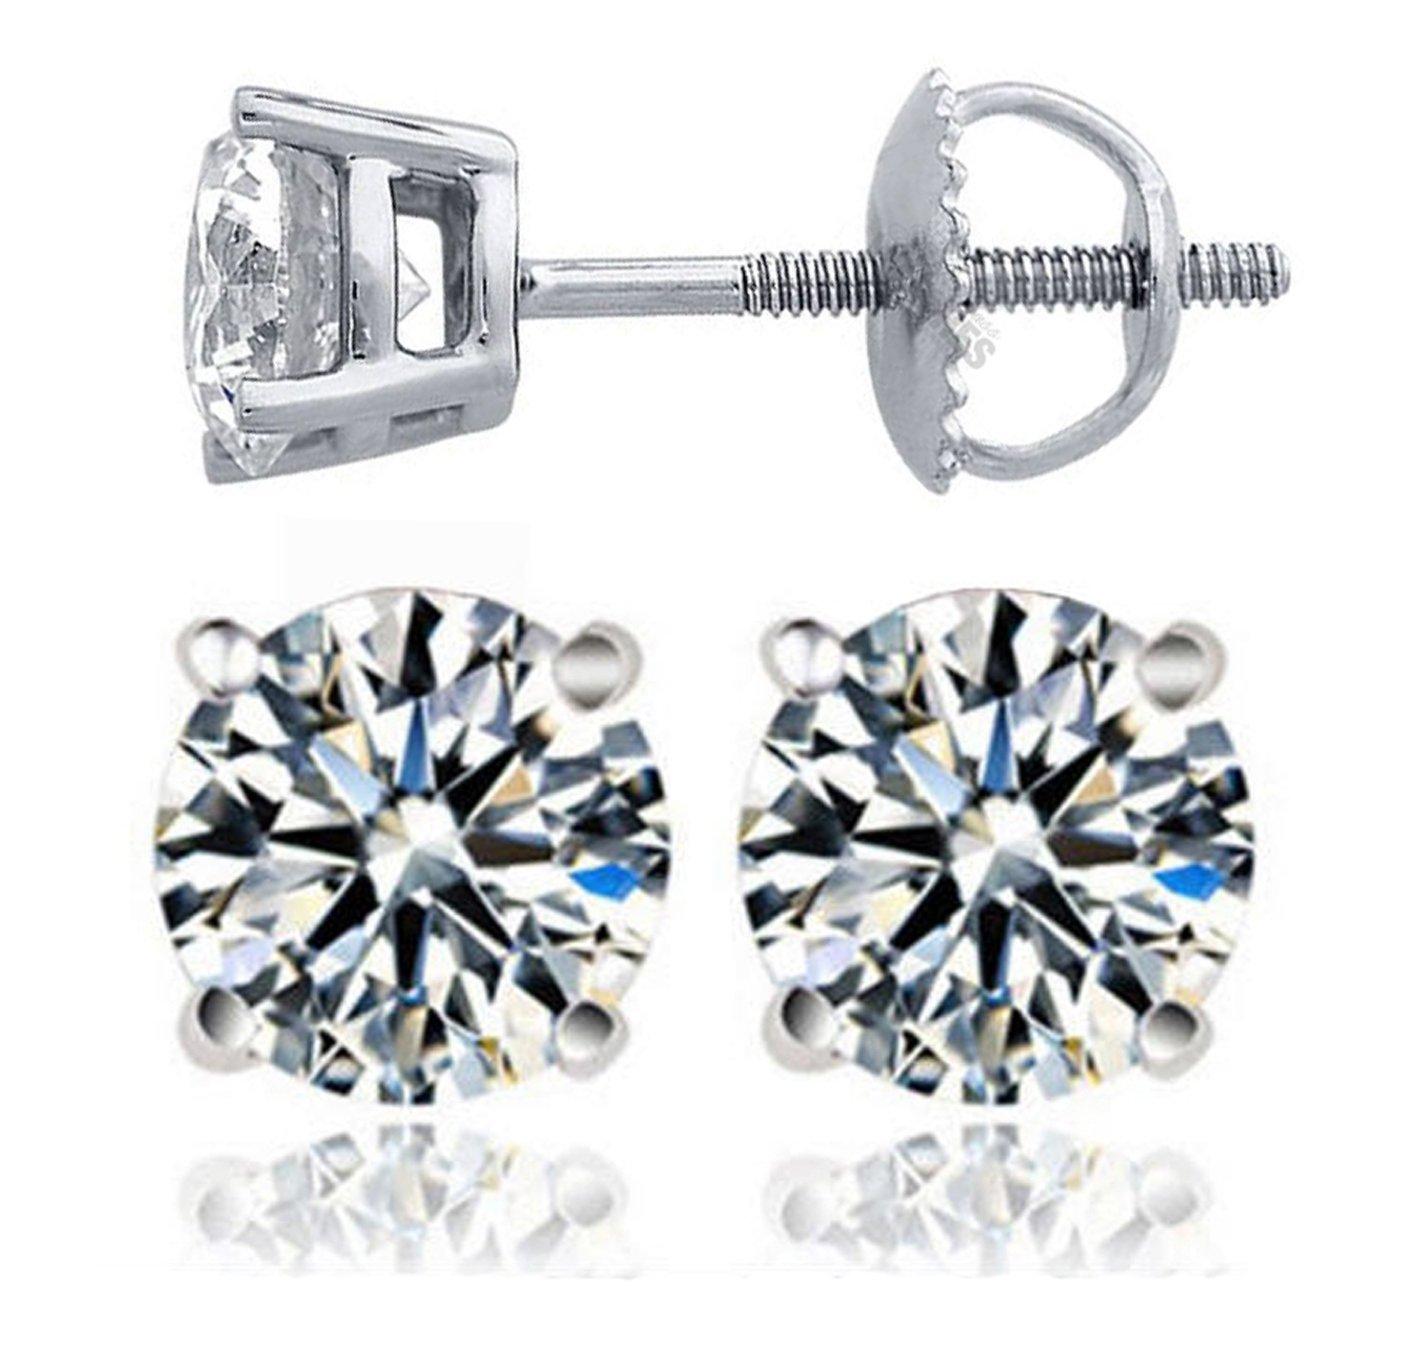 Venetia Realistic Top Grade Hearts & Arrows Cut Simulated Diamond Solitaire Earrings Earstuds Screw Back 925 Silver 0.75 1.5 Carat cz cubic zirconia E6mR